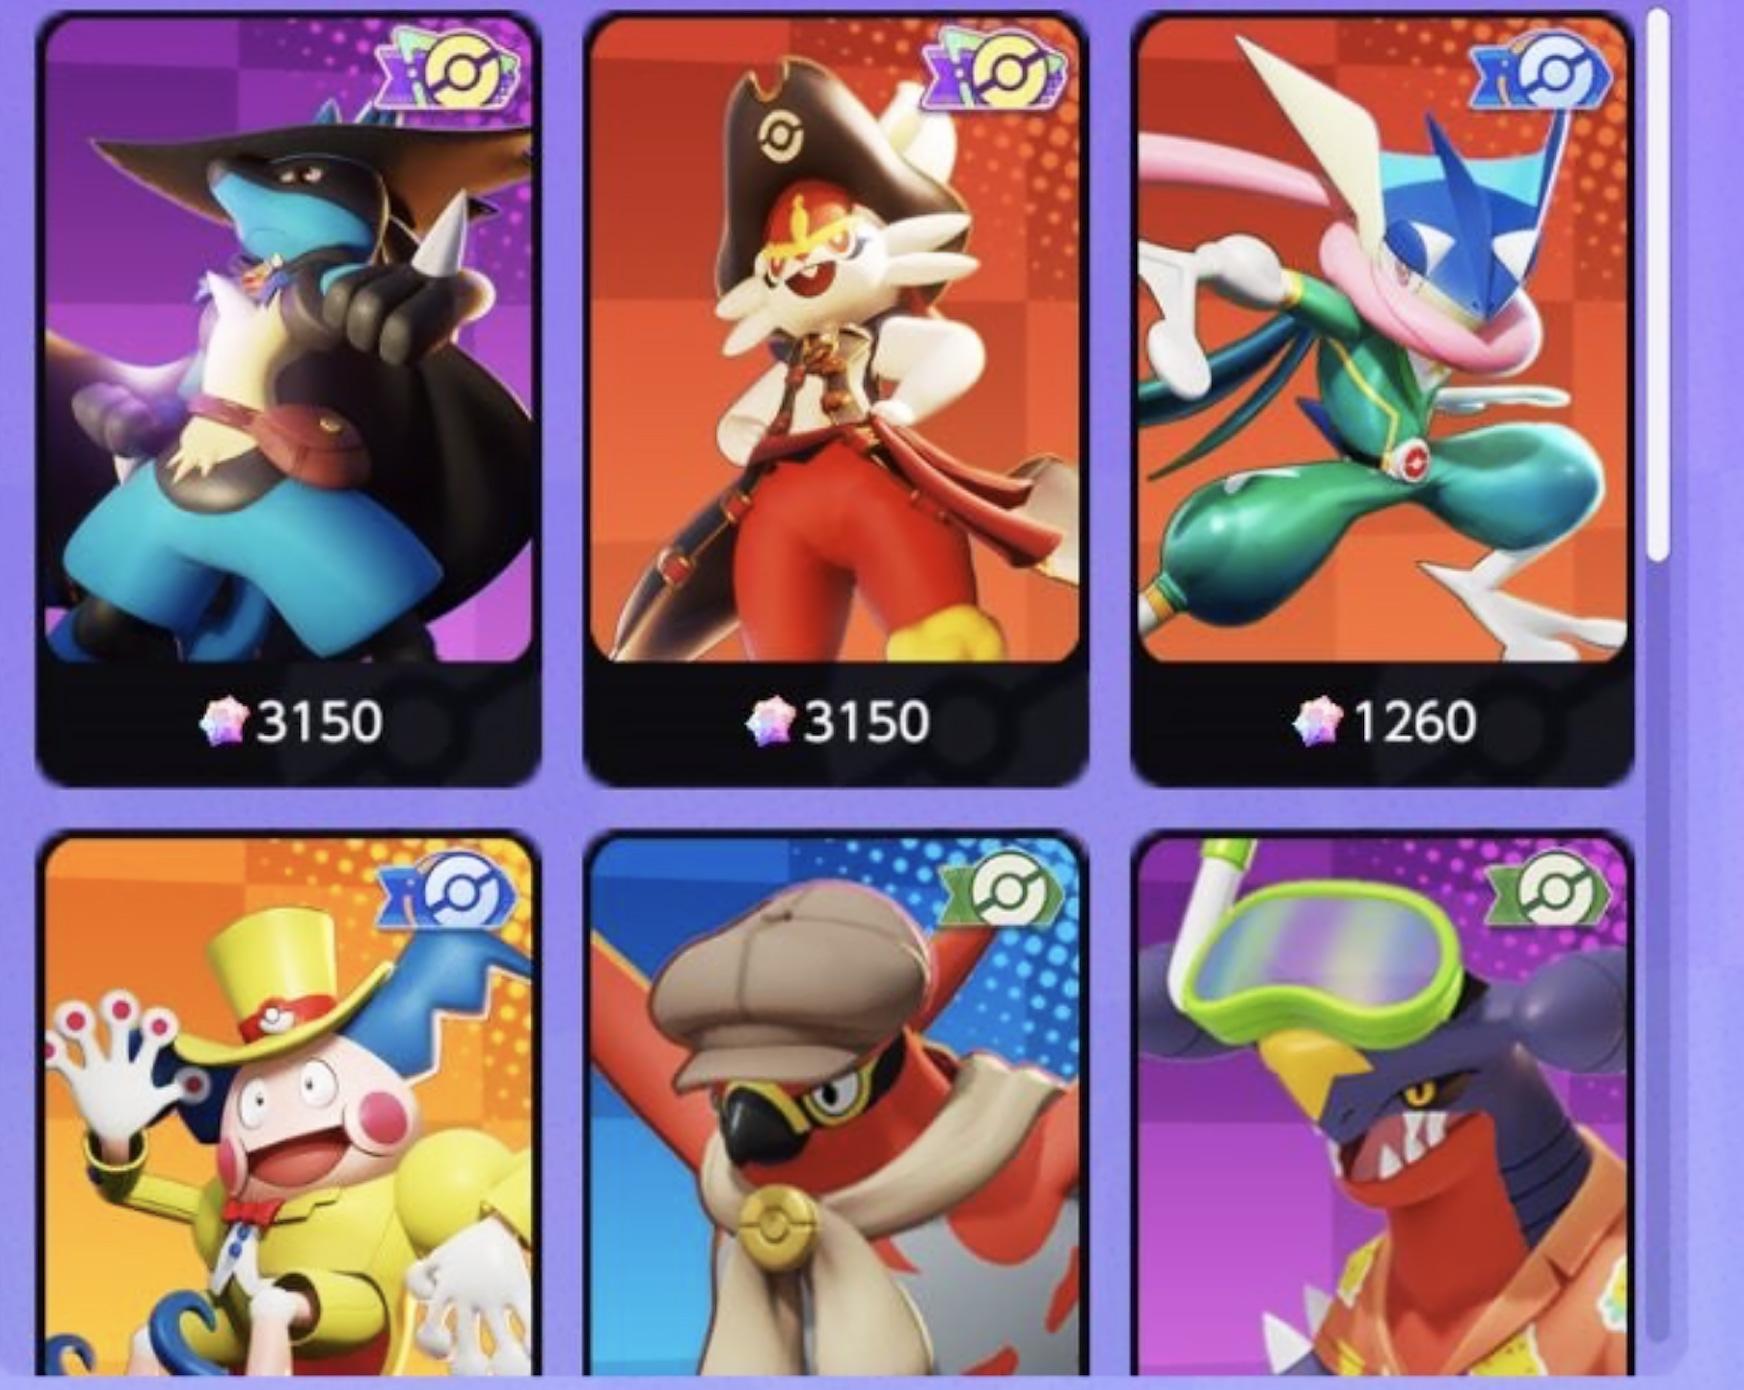 Skins Pokémon Unite